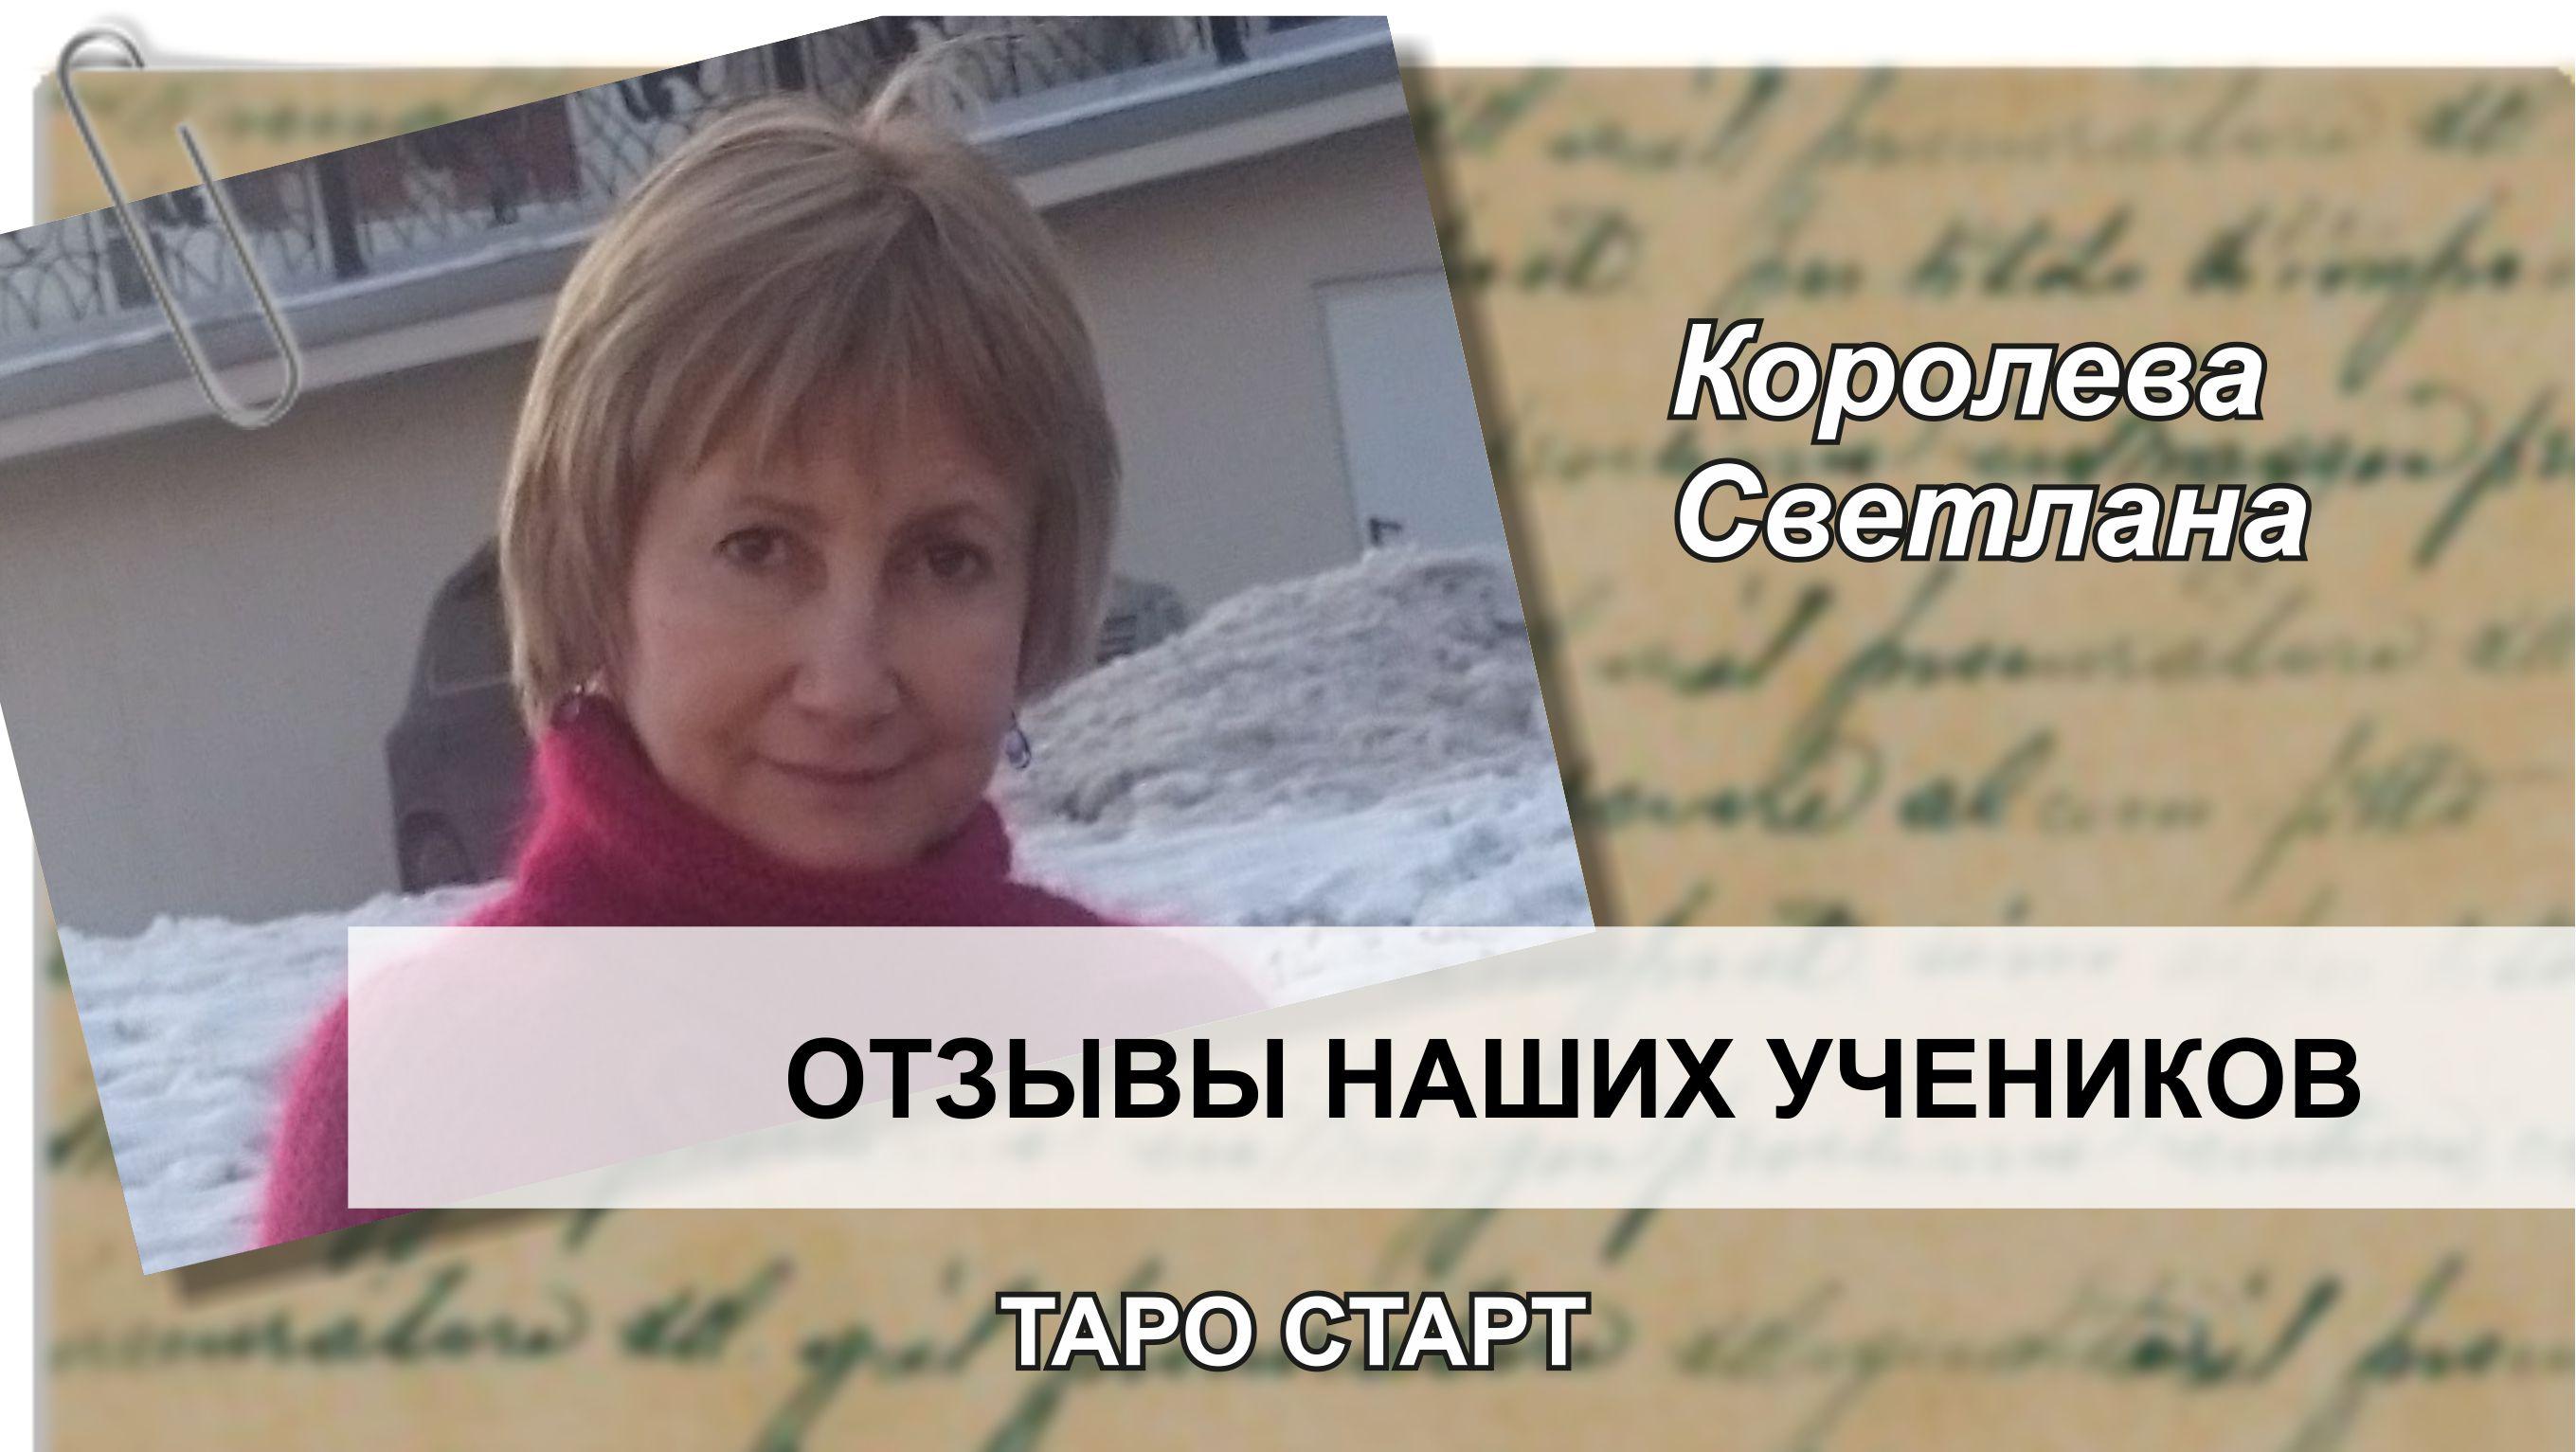 Королева Светлана отзыв Таро Старт